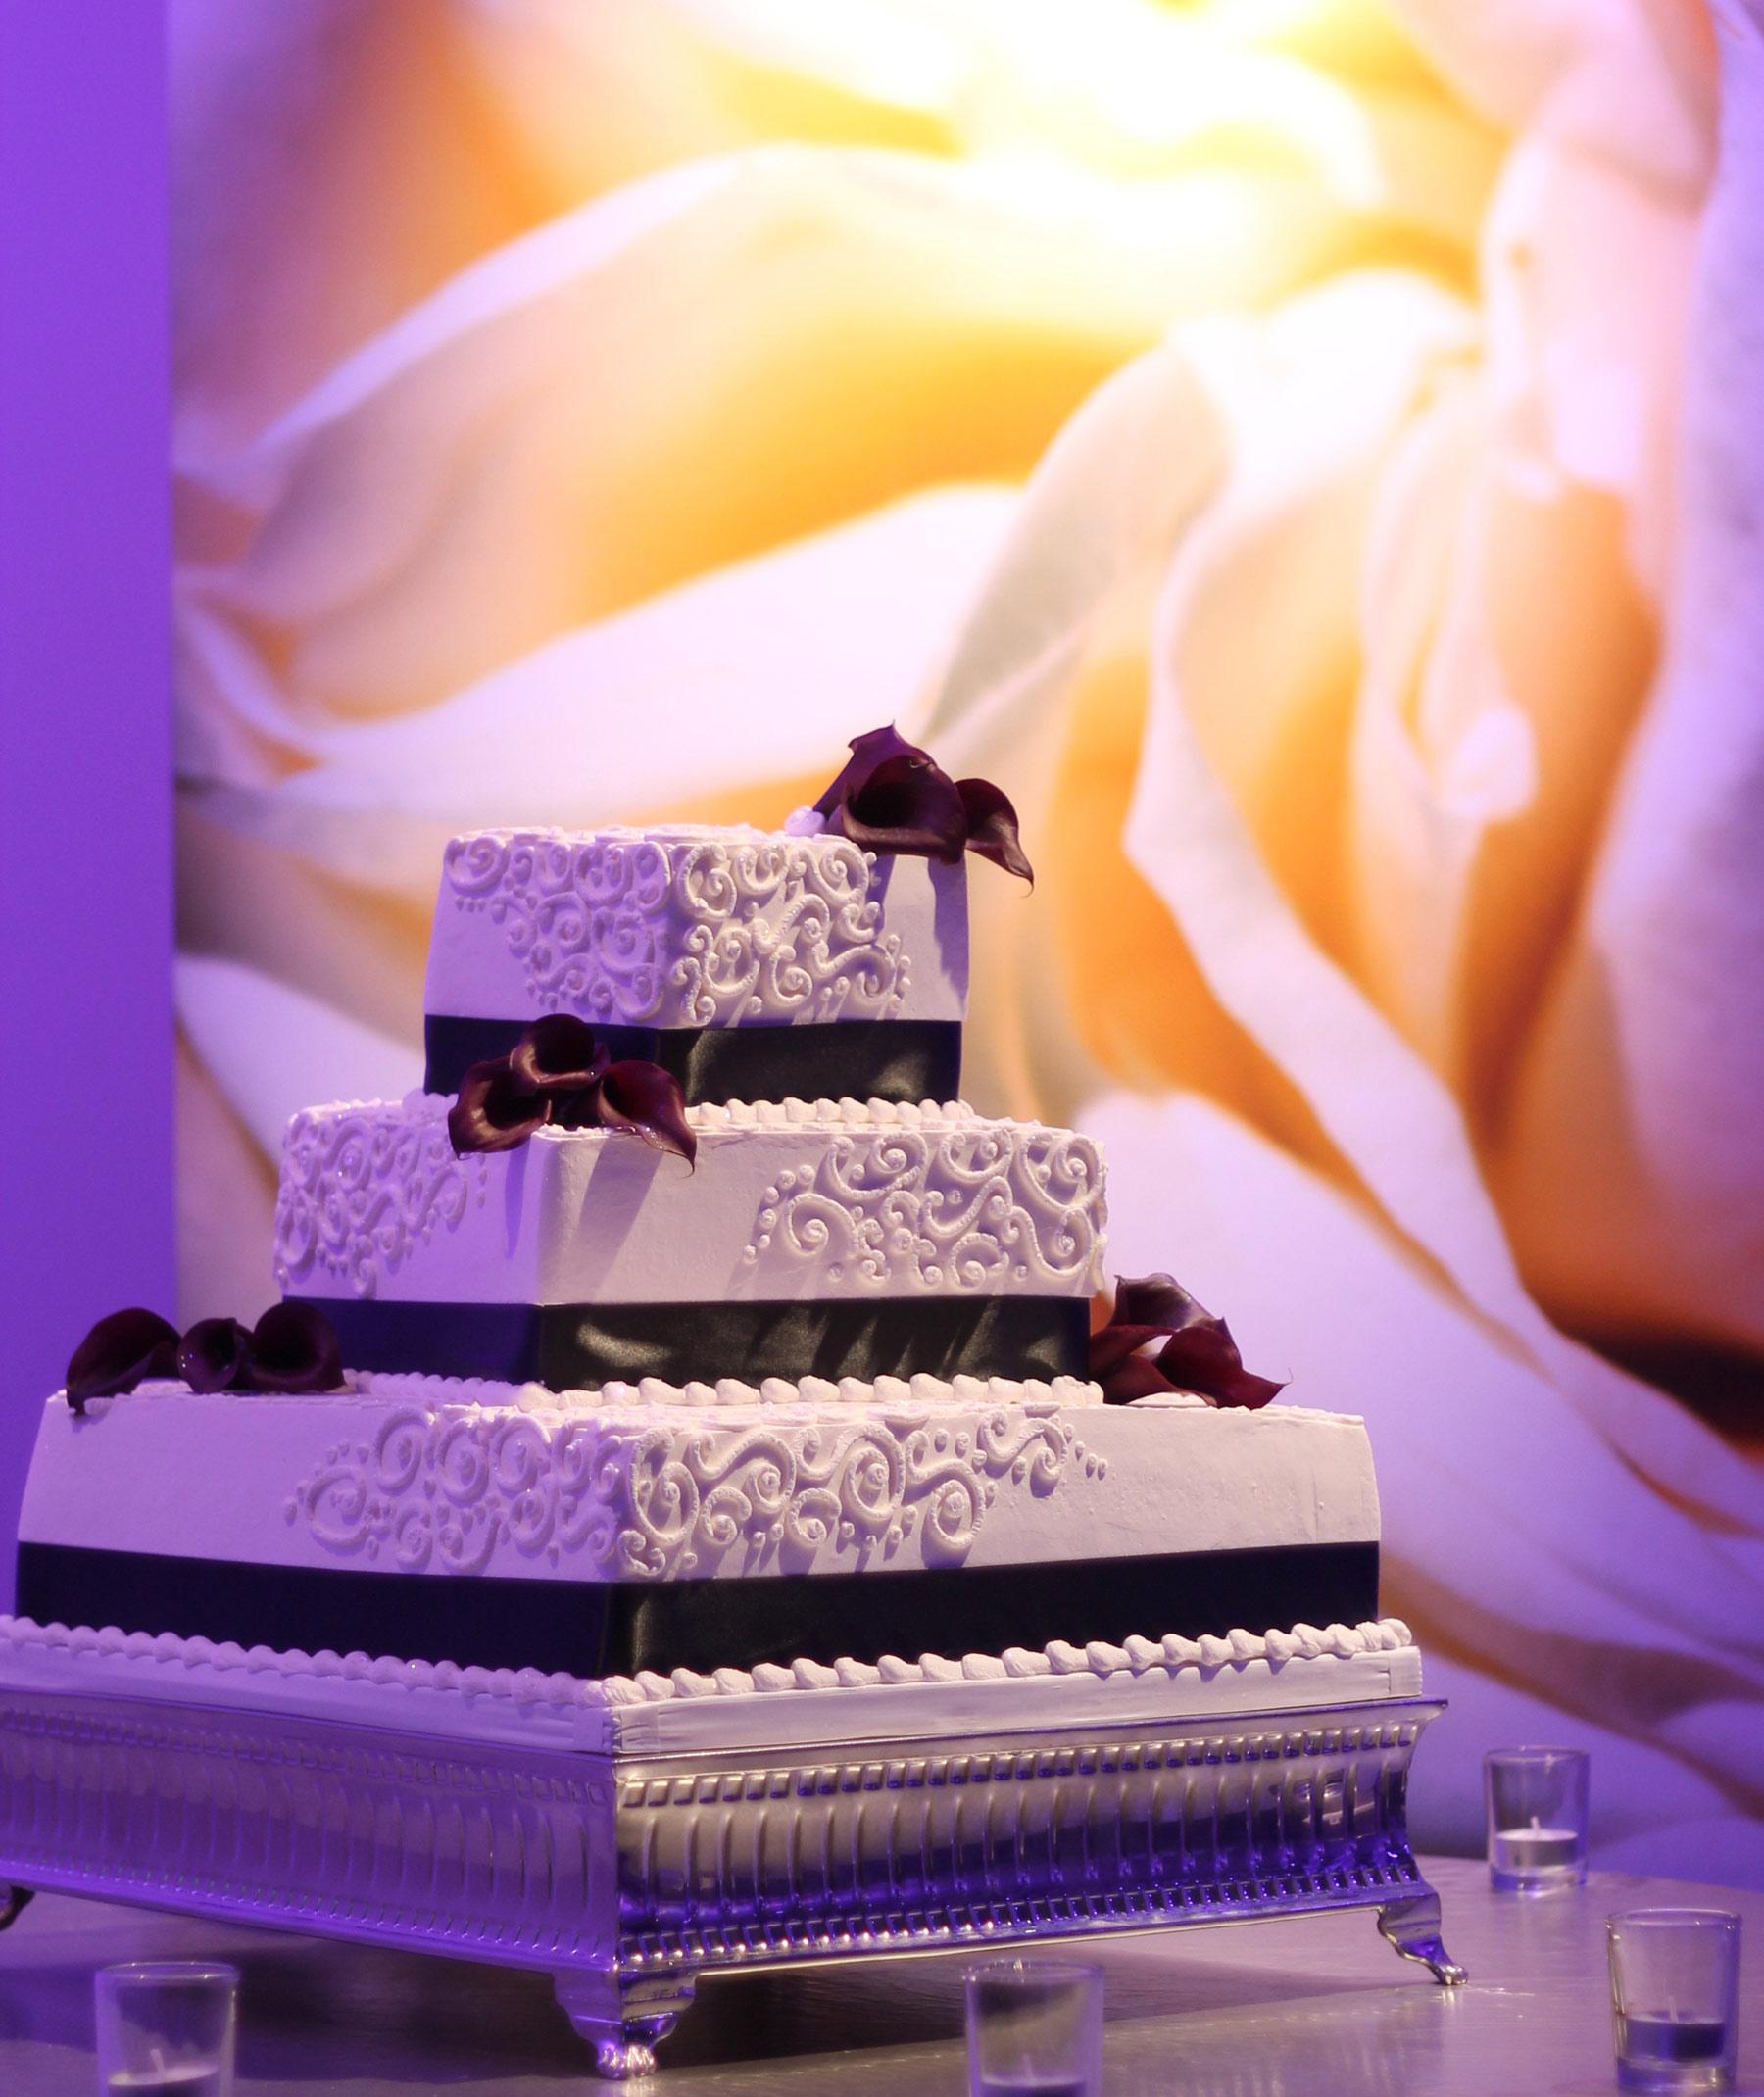 Wedding Cake 3 Tier 7 Degrees Blue Orange Square Black